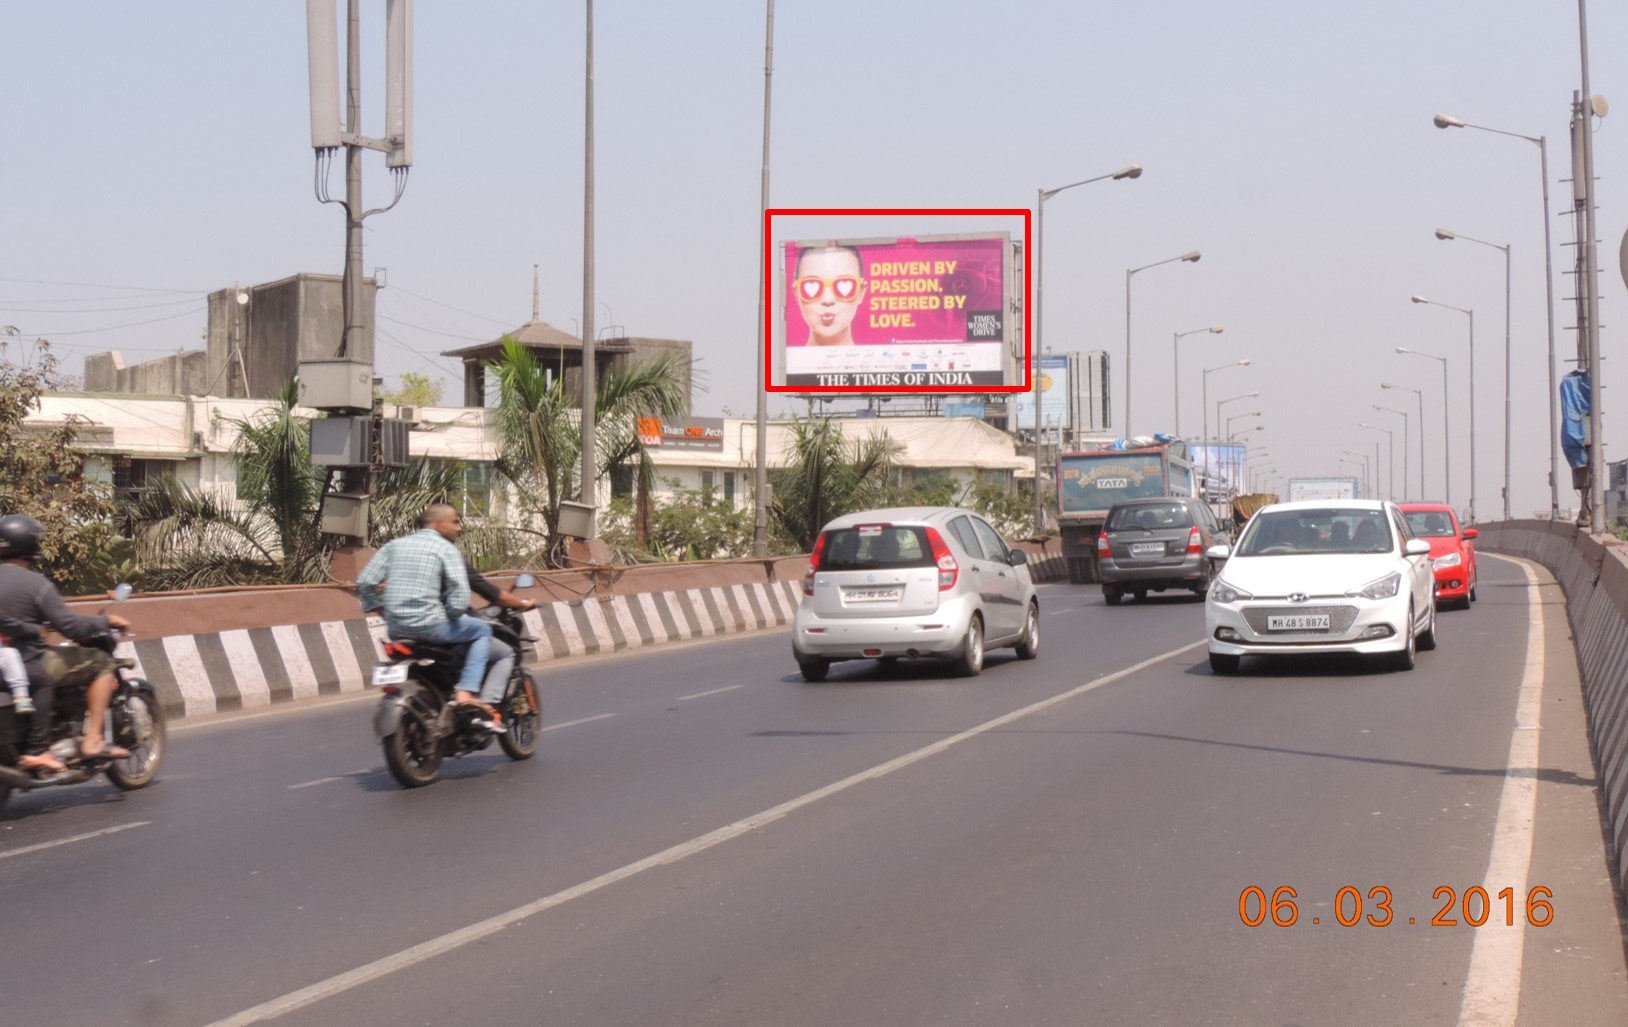 Sion Flyover ET, Mumbai